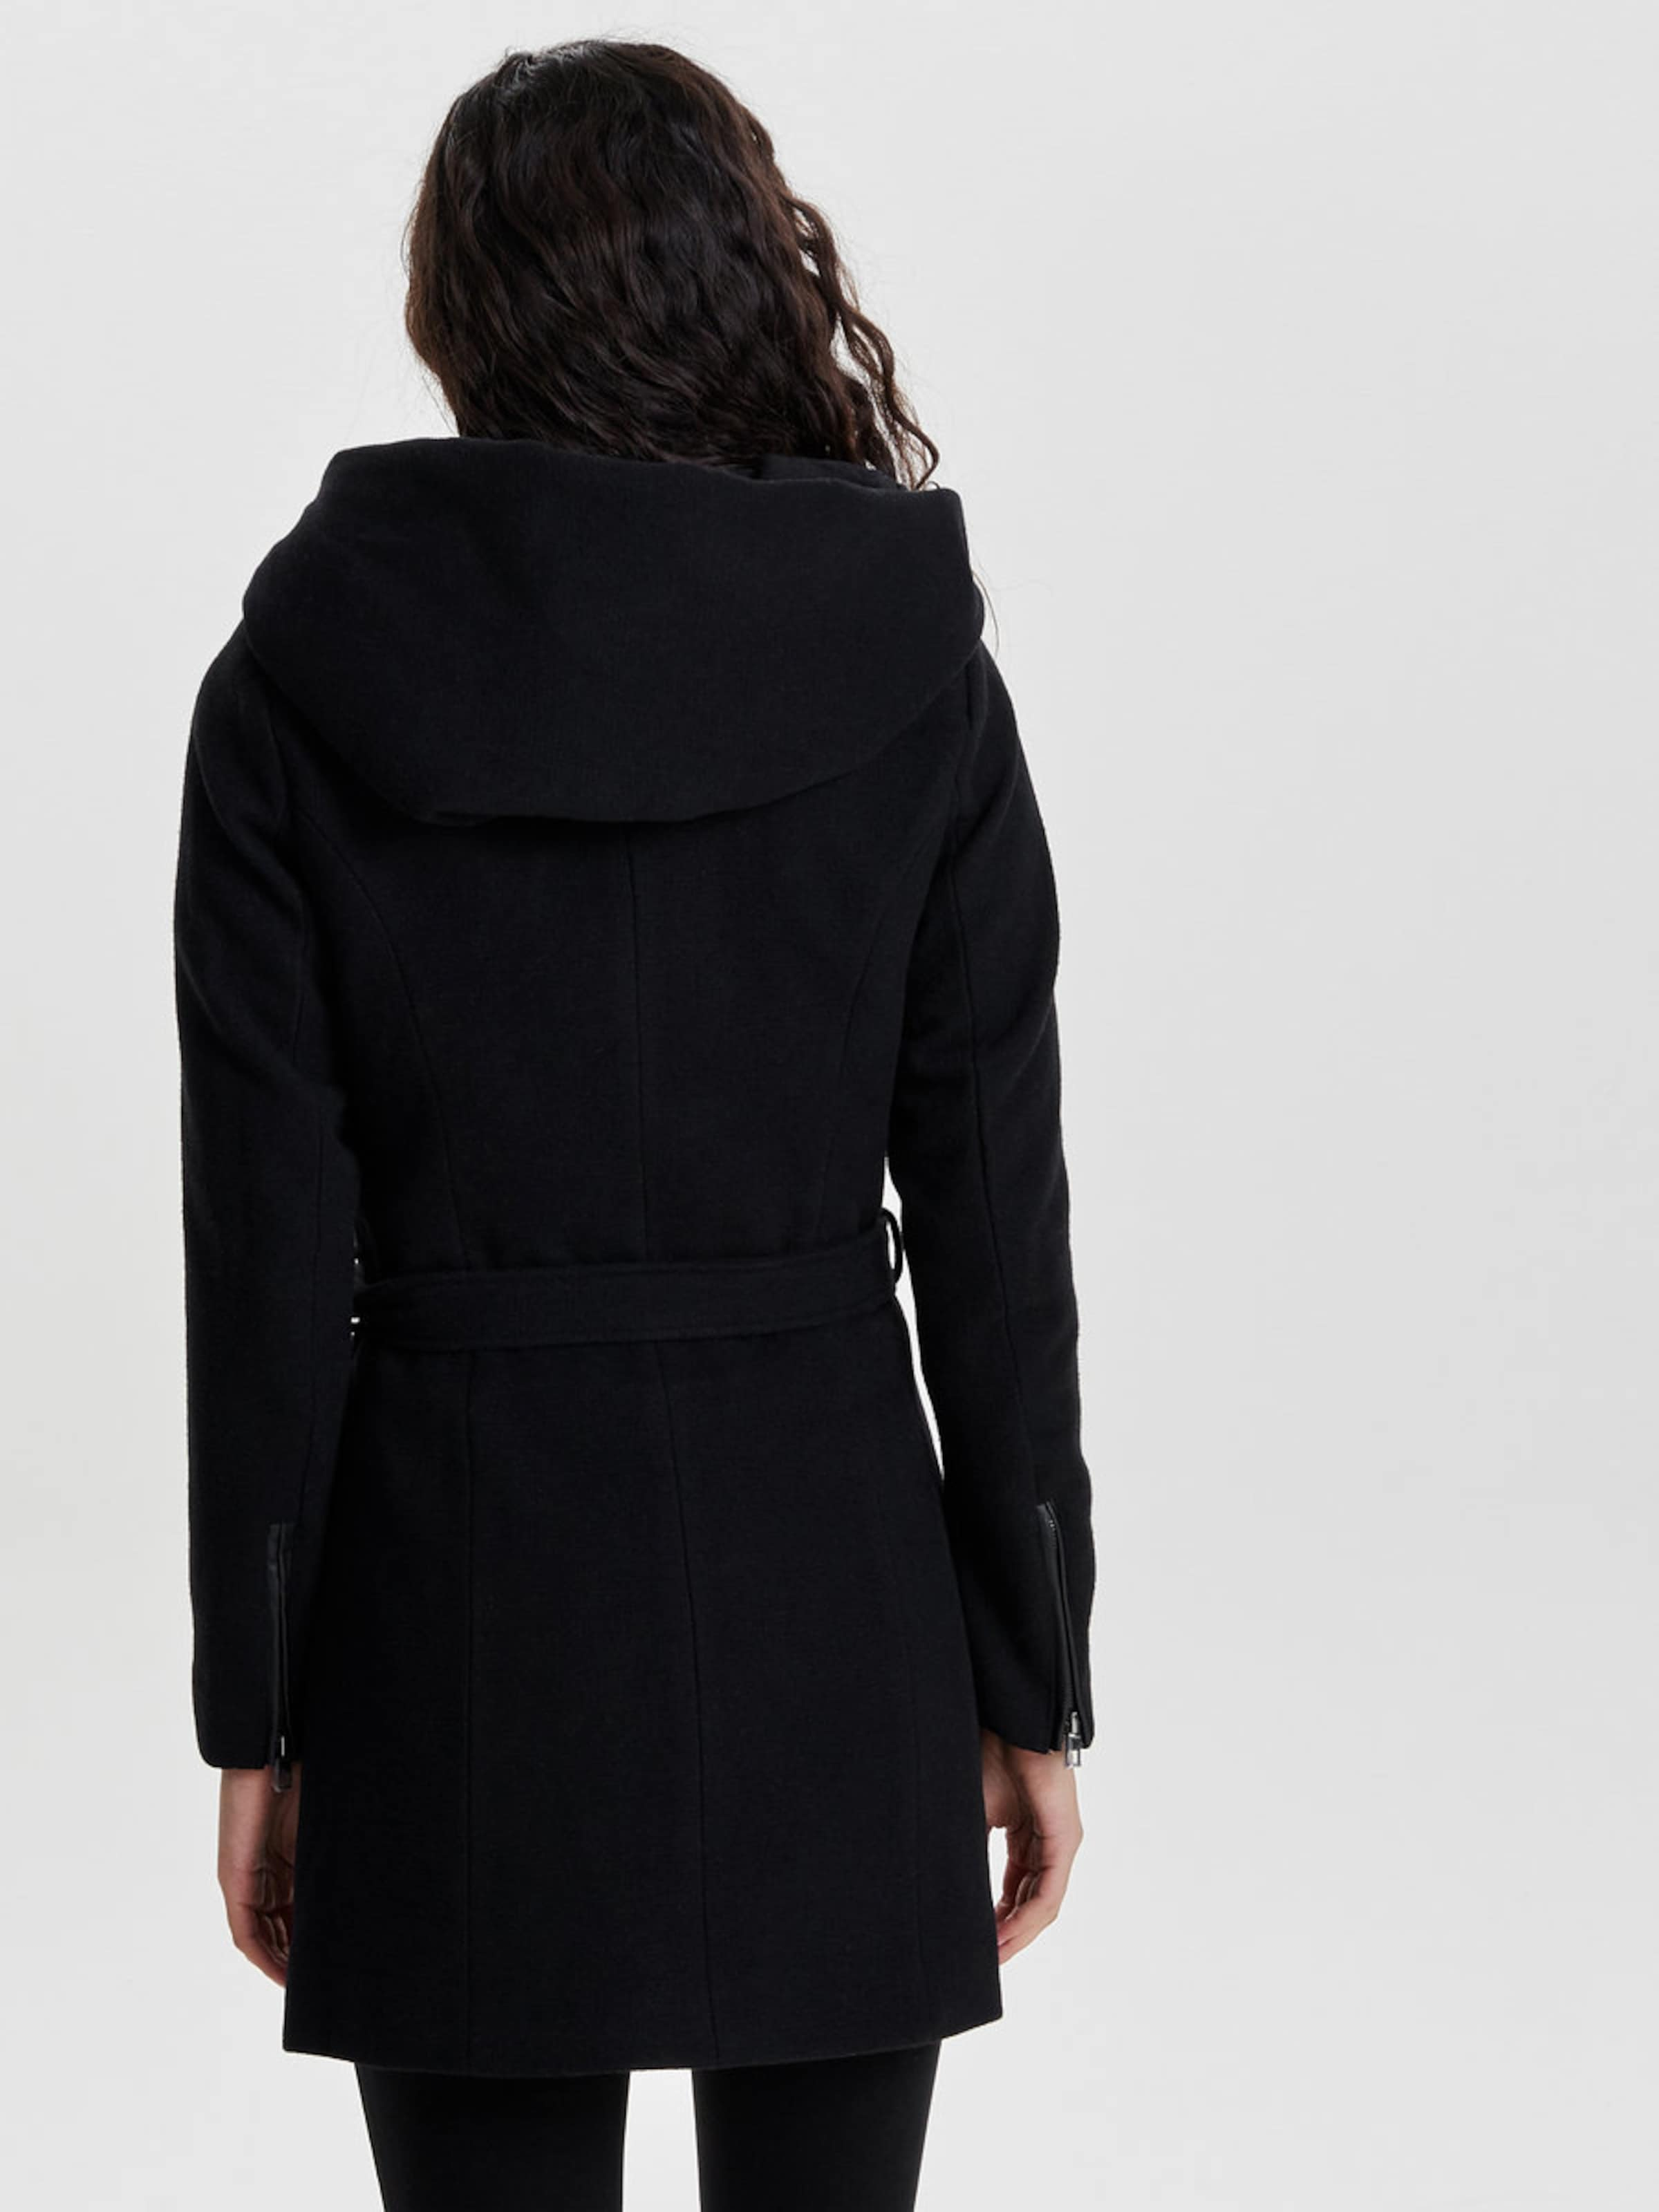 ONLY Woll-Mantel Bestes Großhandel Online Spielraum Eastbay Rabatt Günstiger Preis Bakovr2fk4